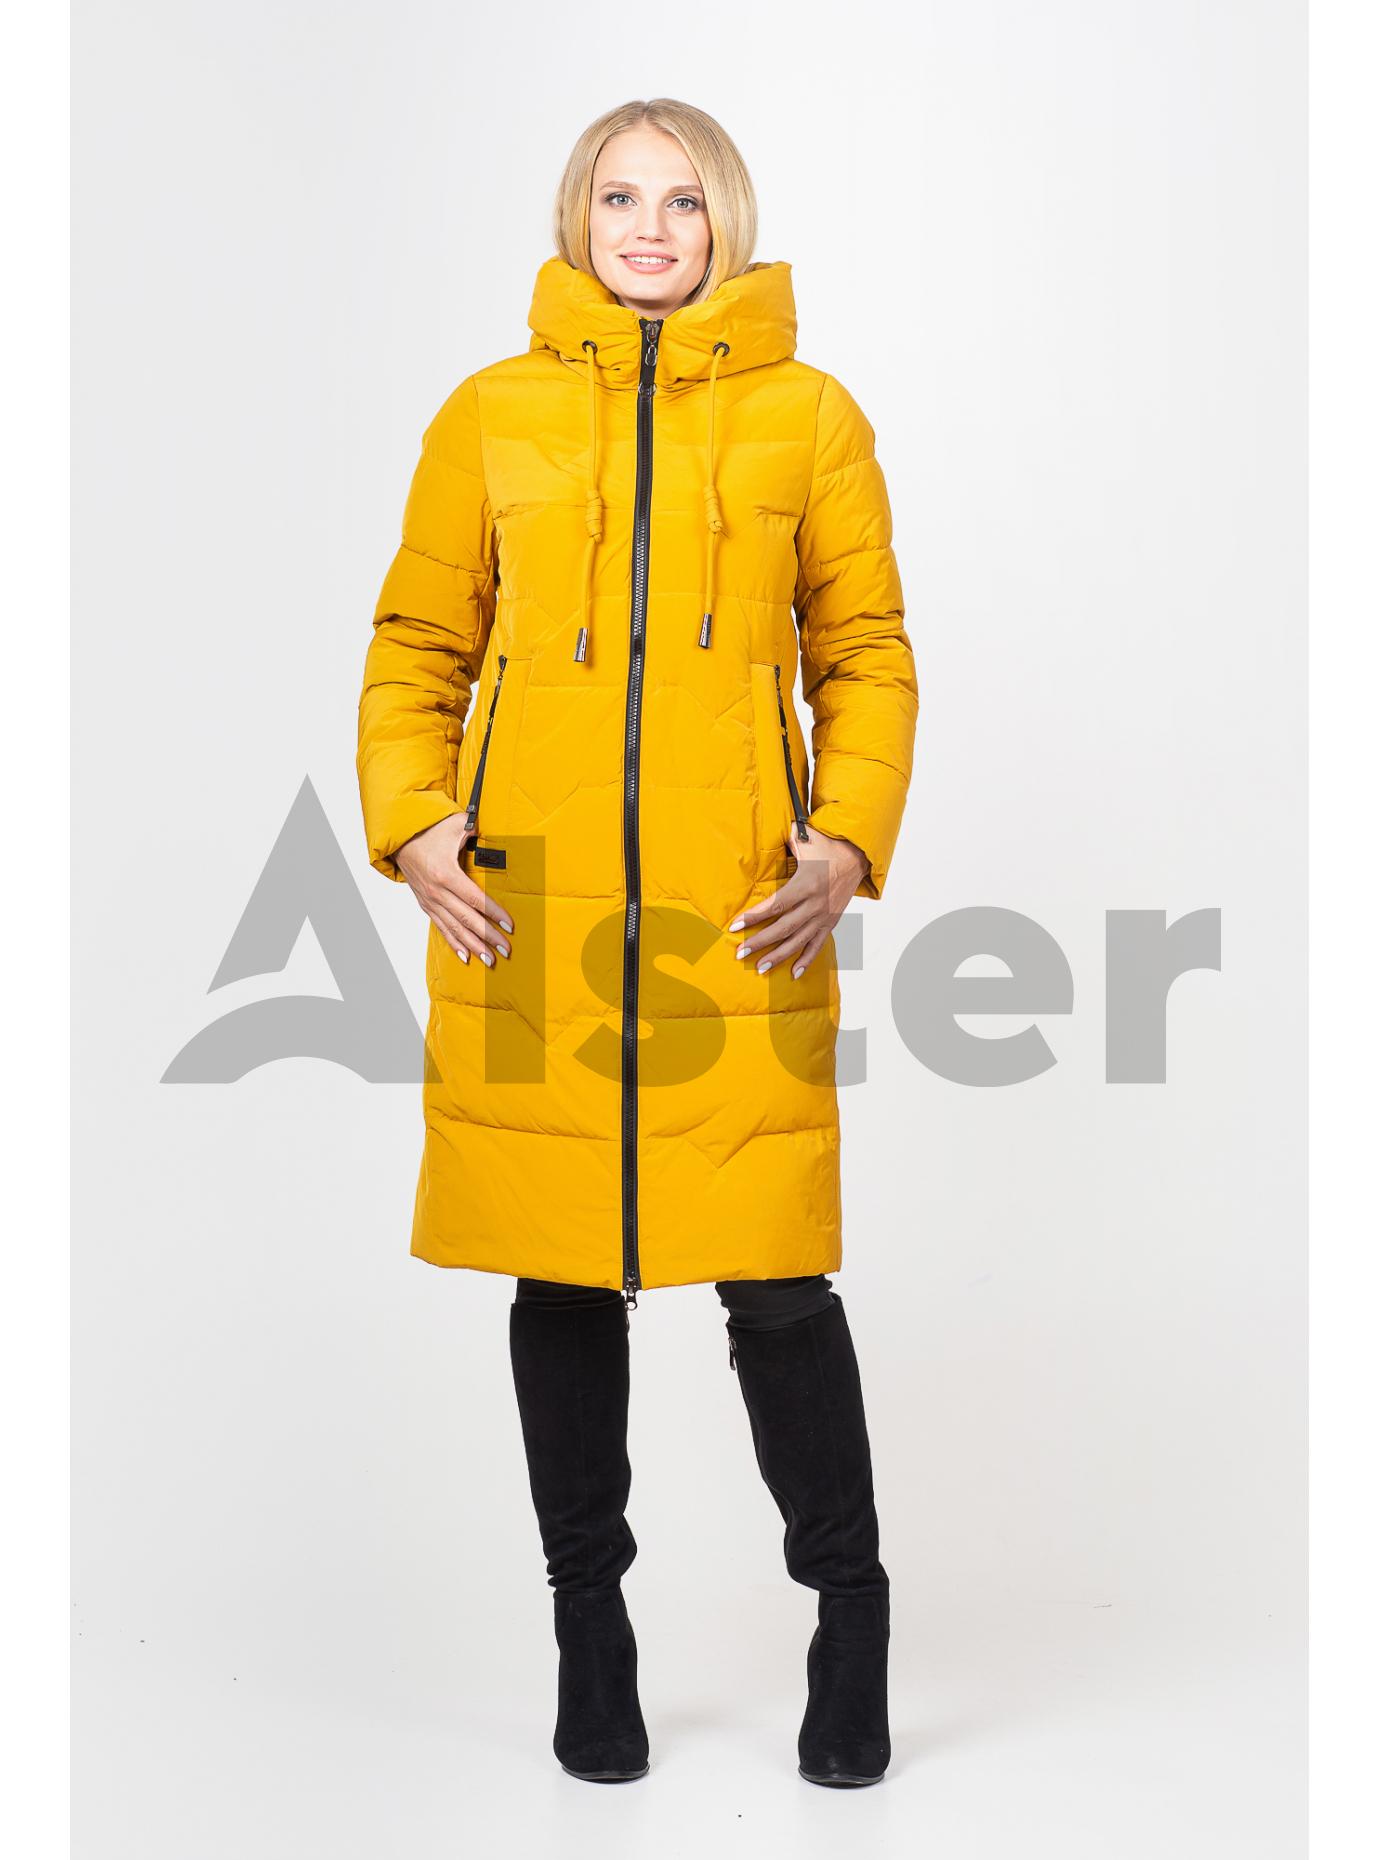 Куртка зимова жіноча довга Темно-жовтий L (07-VP201389): фото - Alster.ua